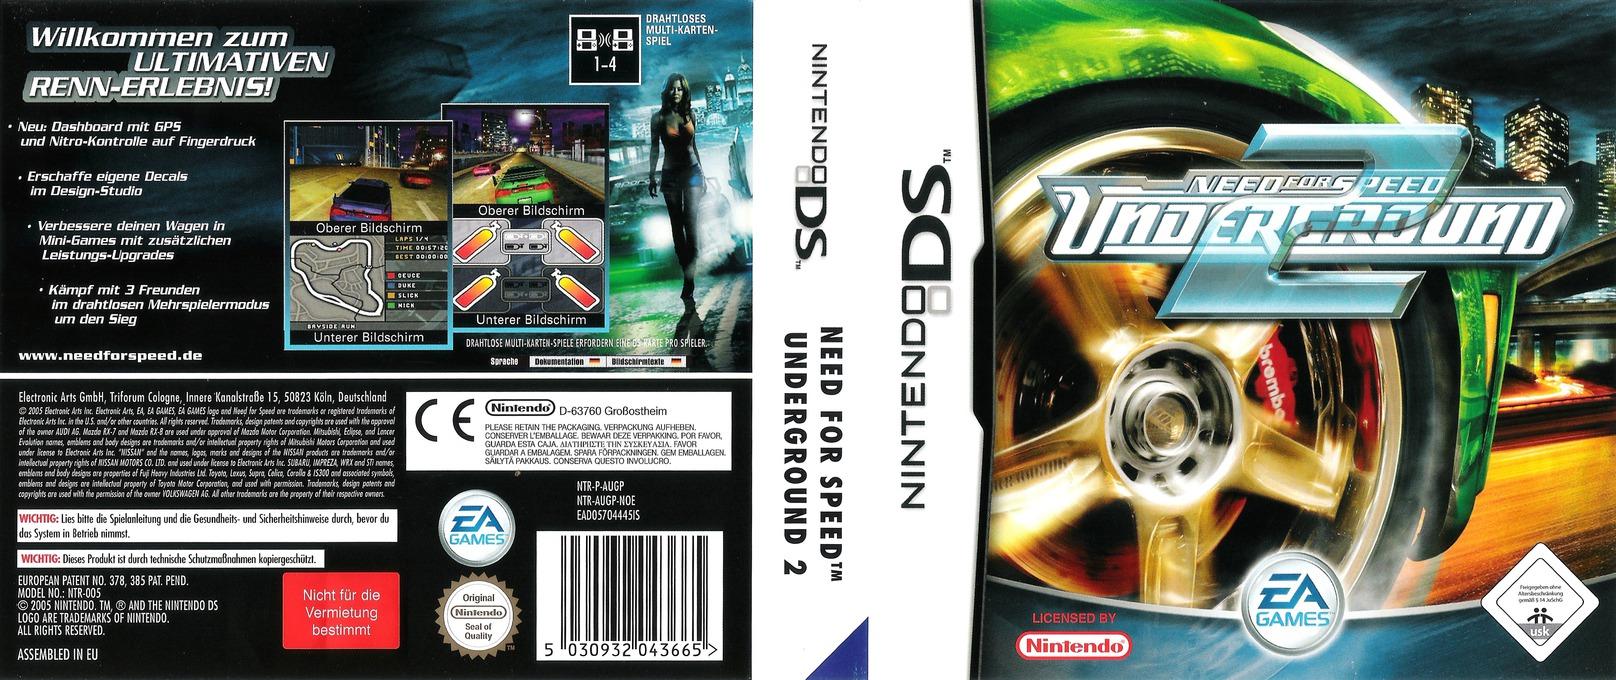 Augp Need For Speed Underground 2